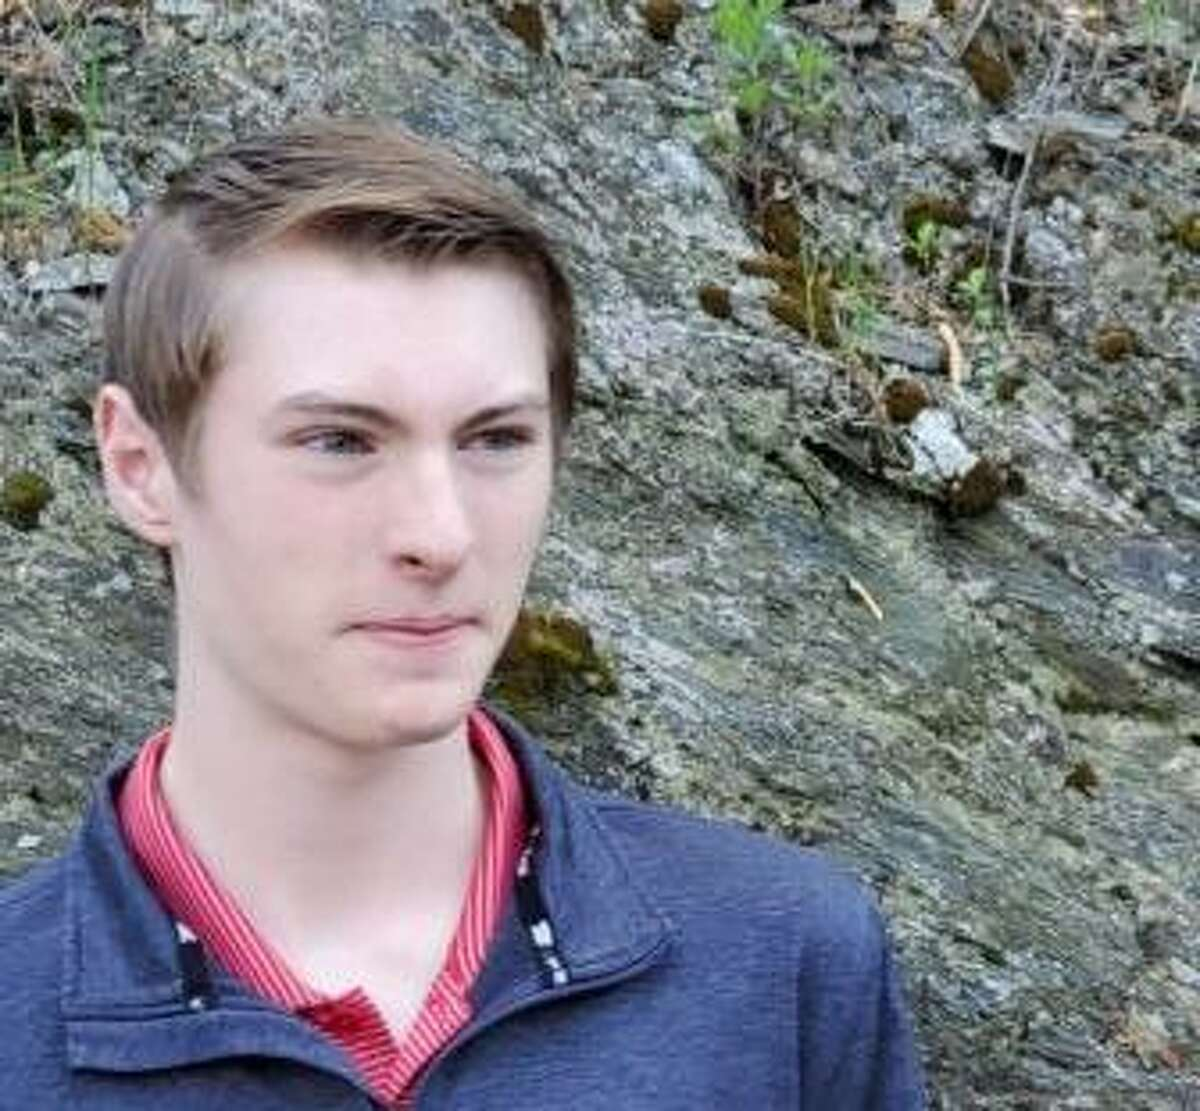 Daniel Hand student Eric Dillner